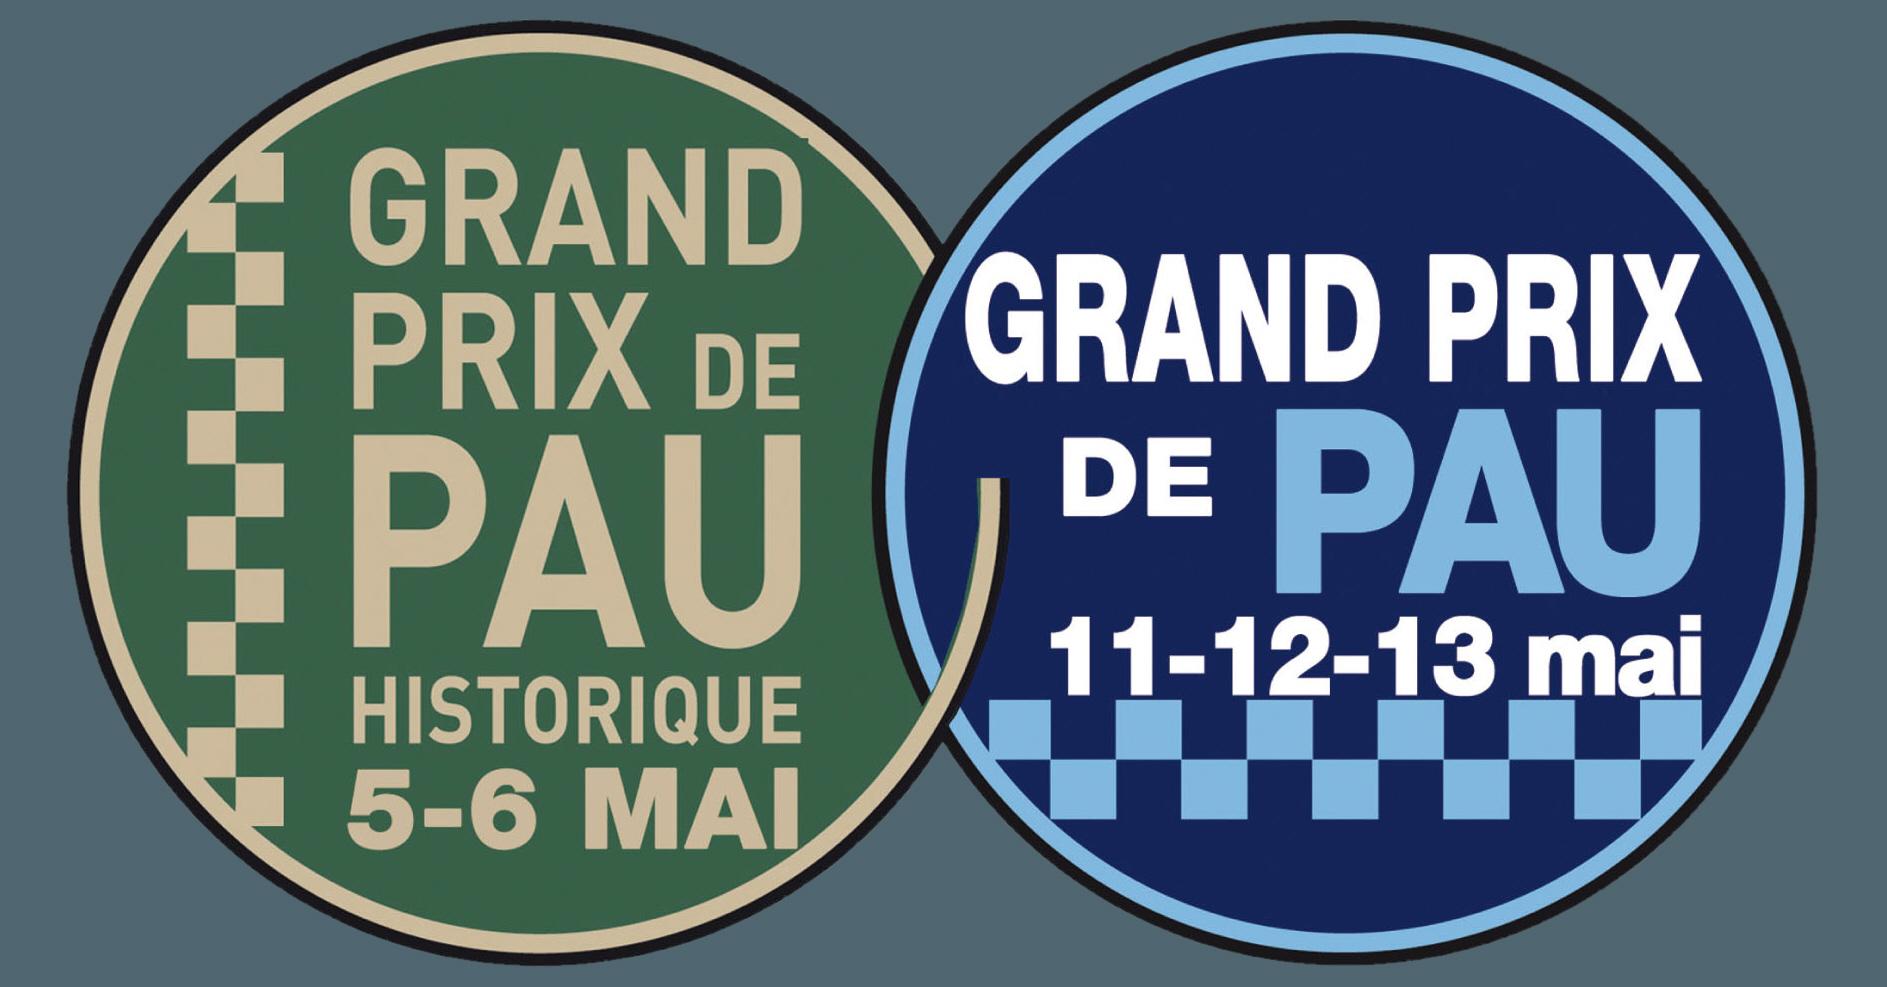 Grands Prix de Pau 2012